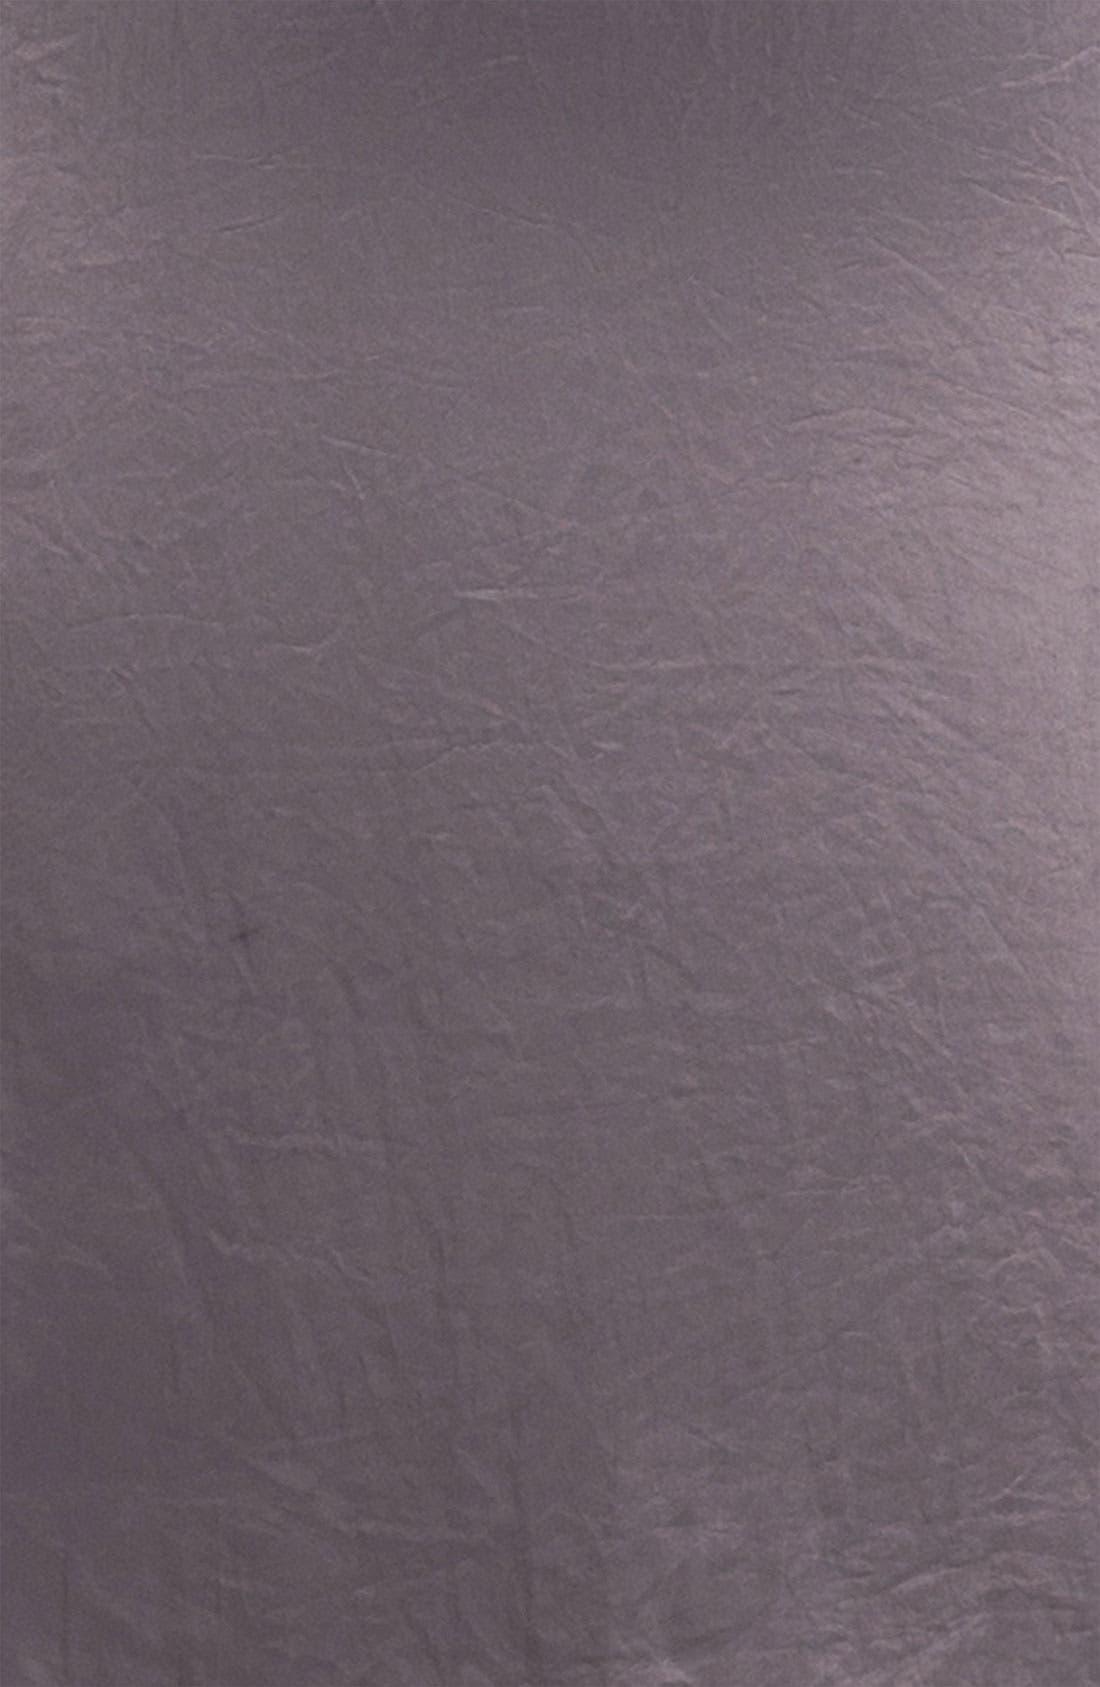 Alternate Image 4  - J Brand Ready-to-Wear 'Mira' Dress